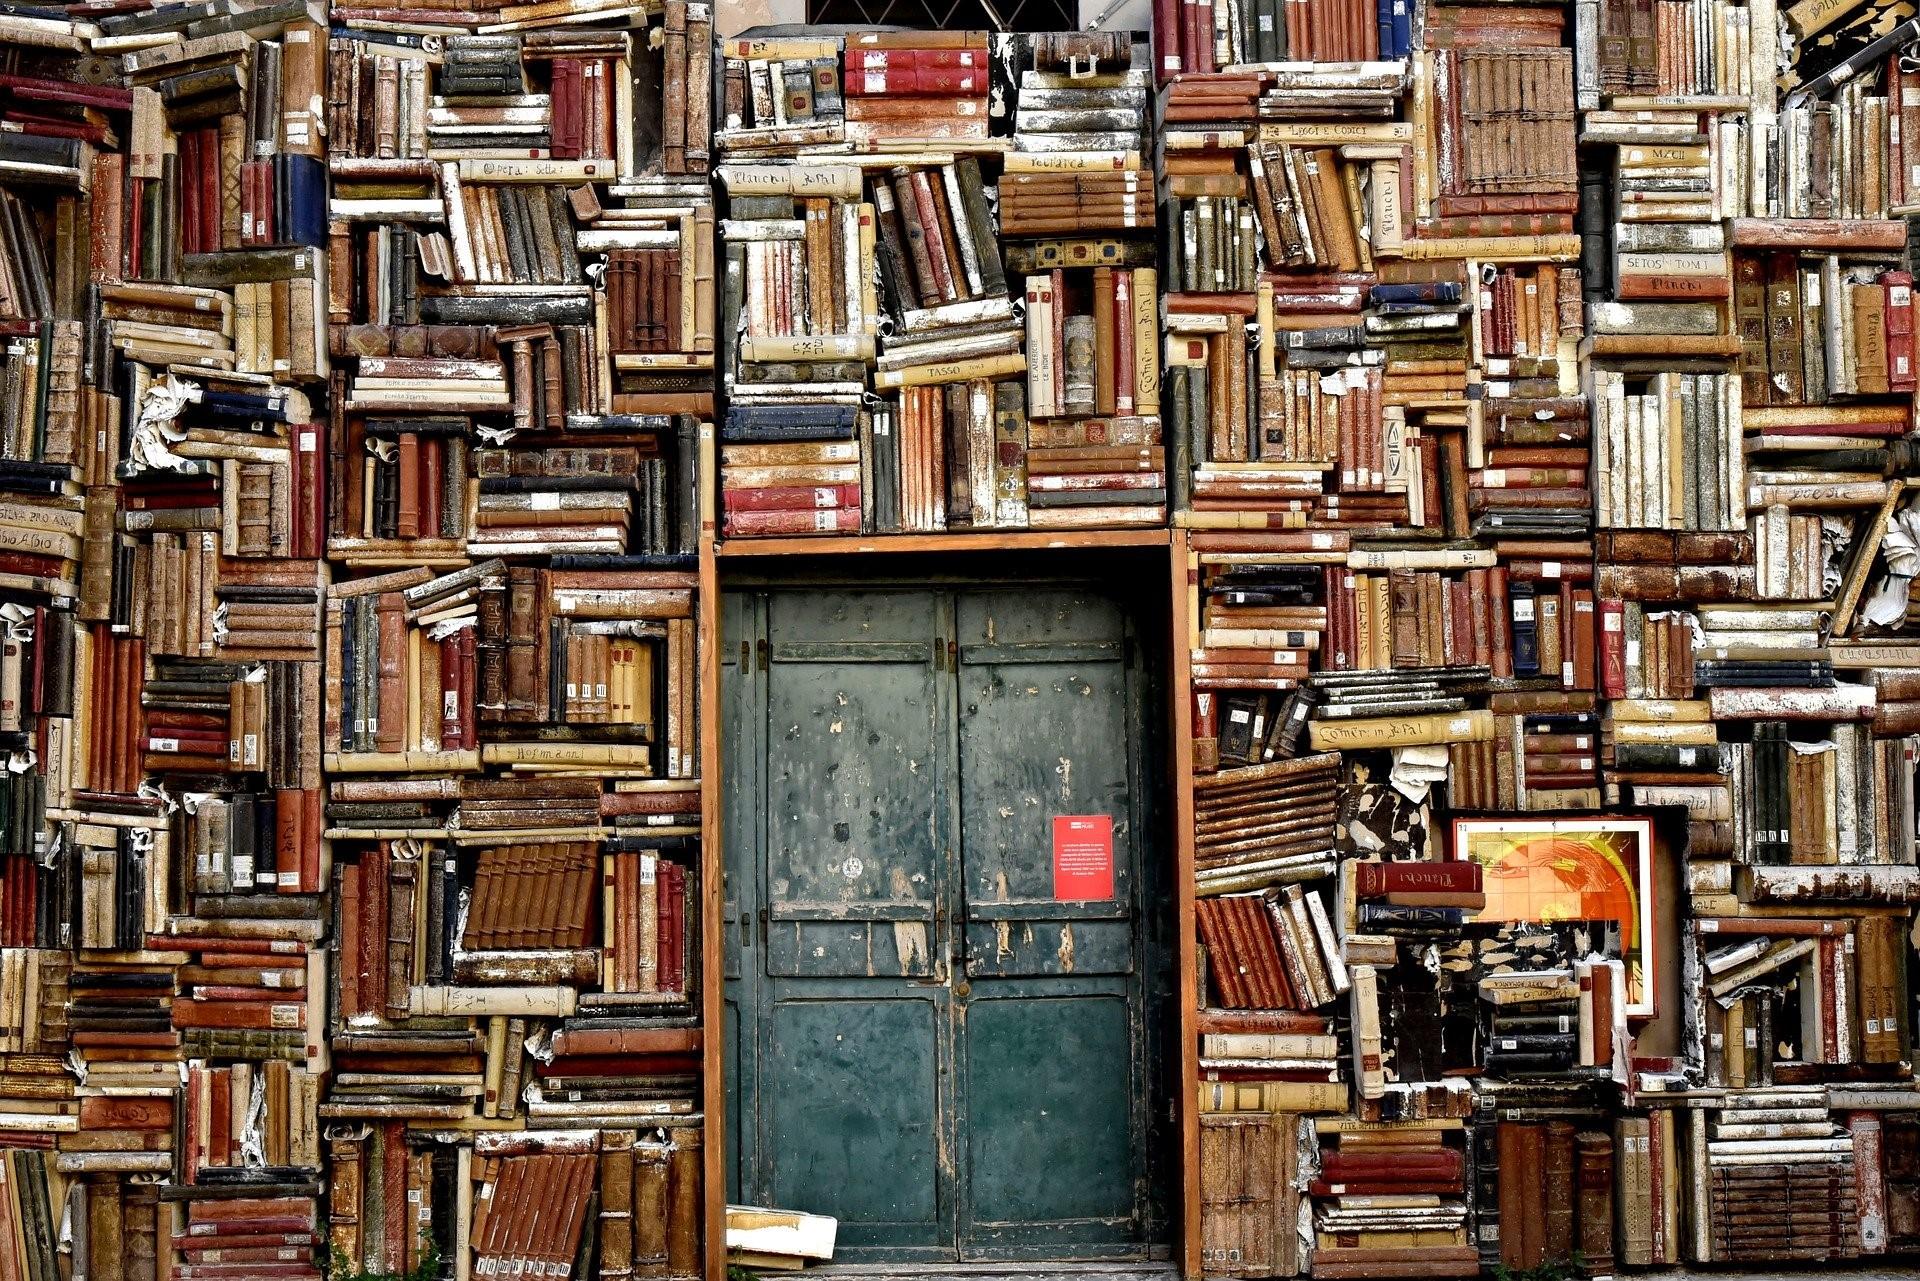 books-1655783_1920-1